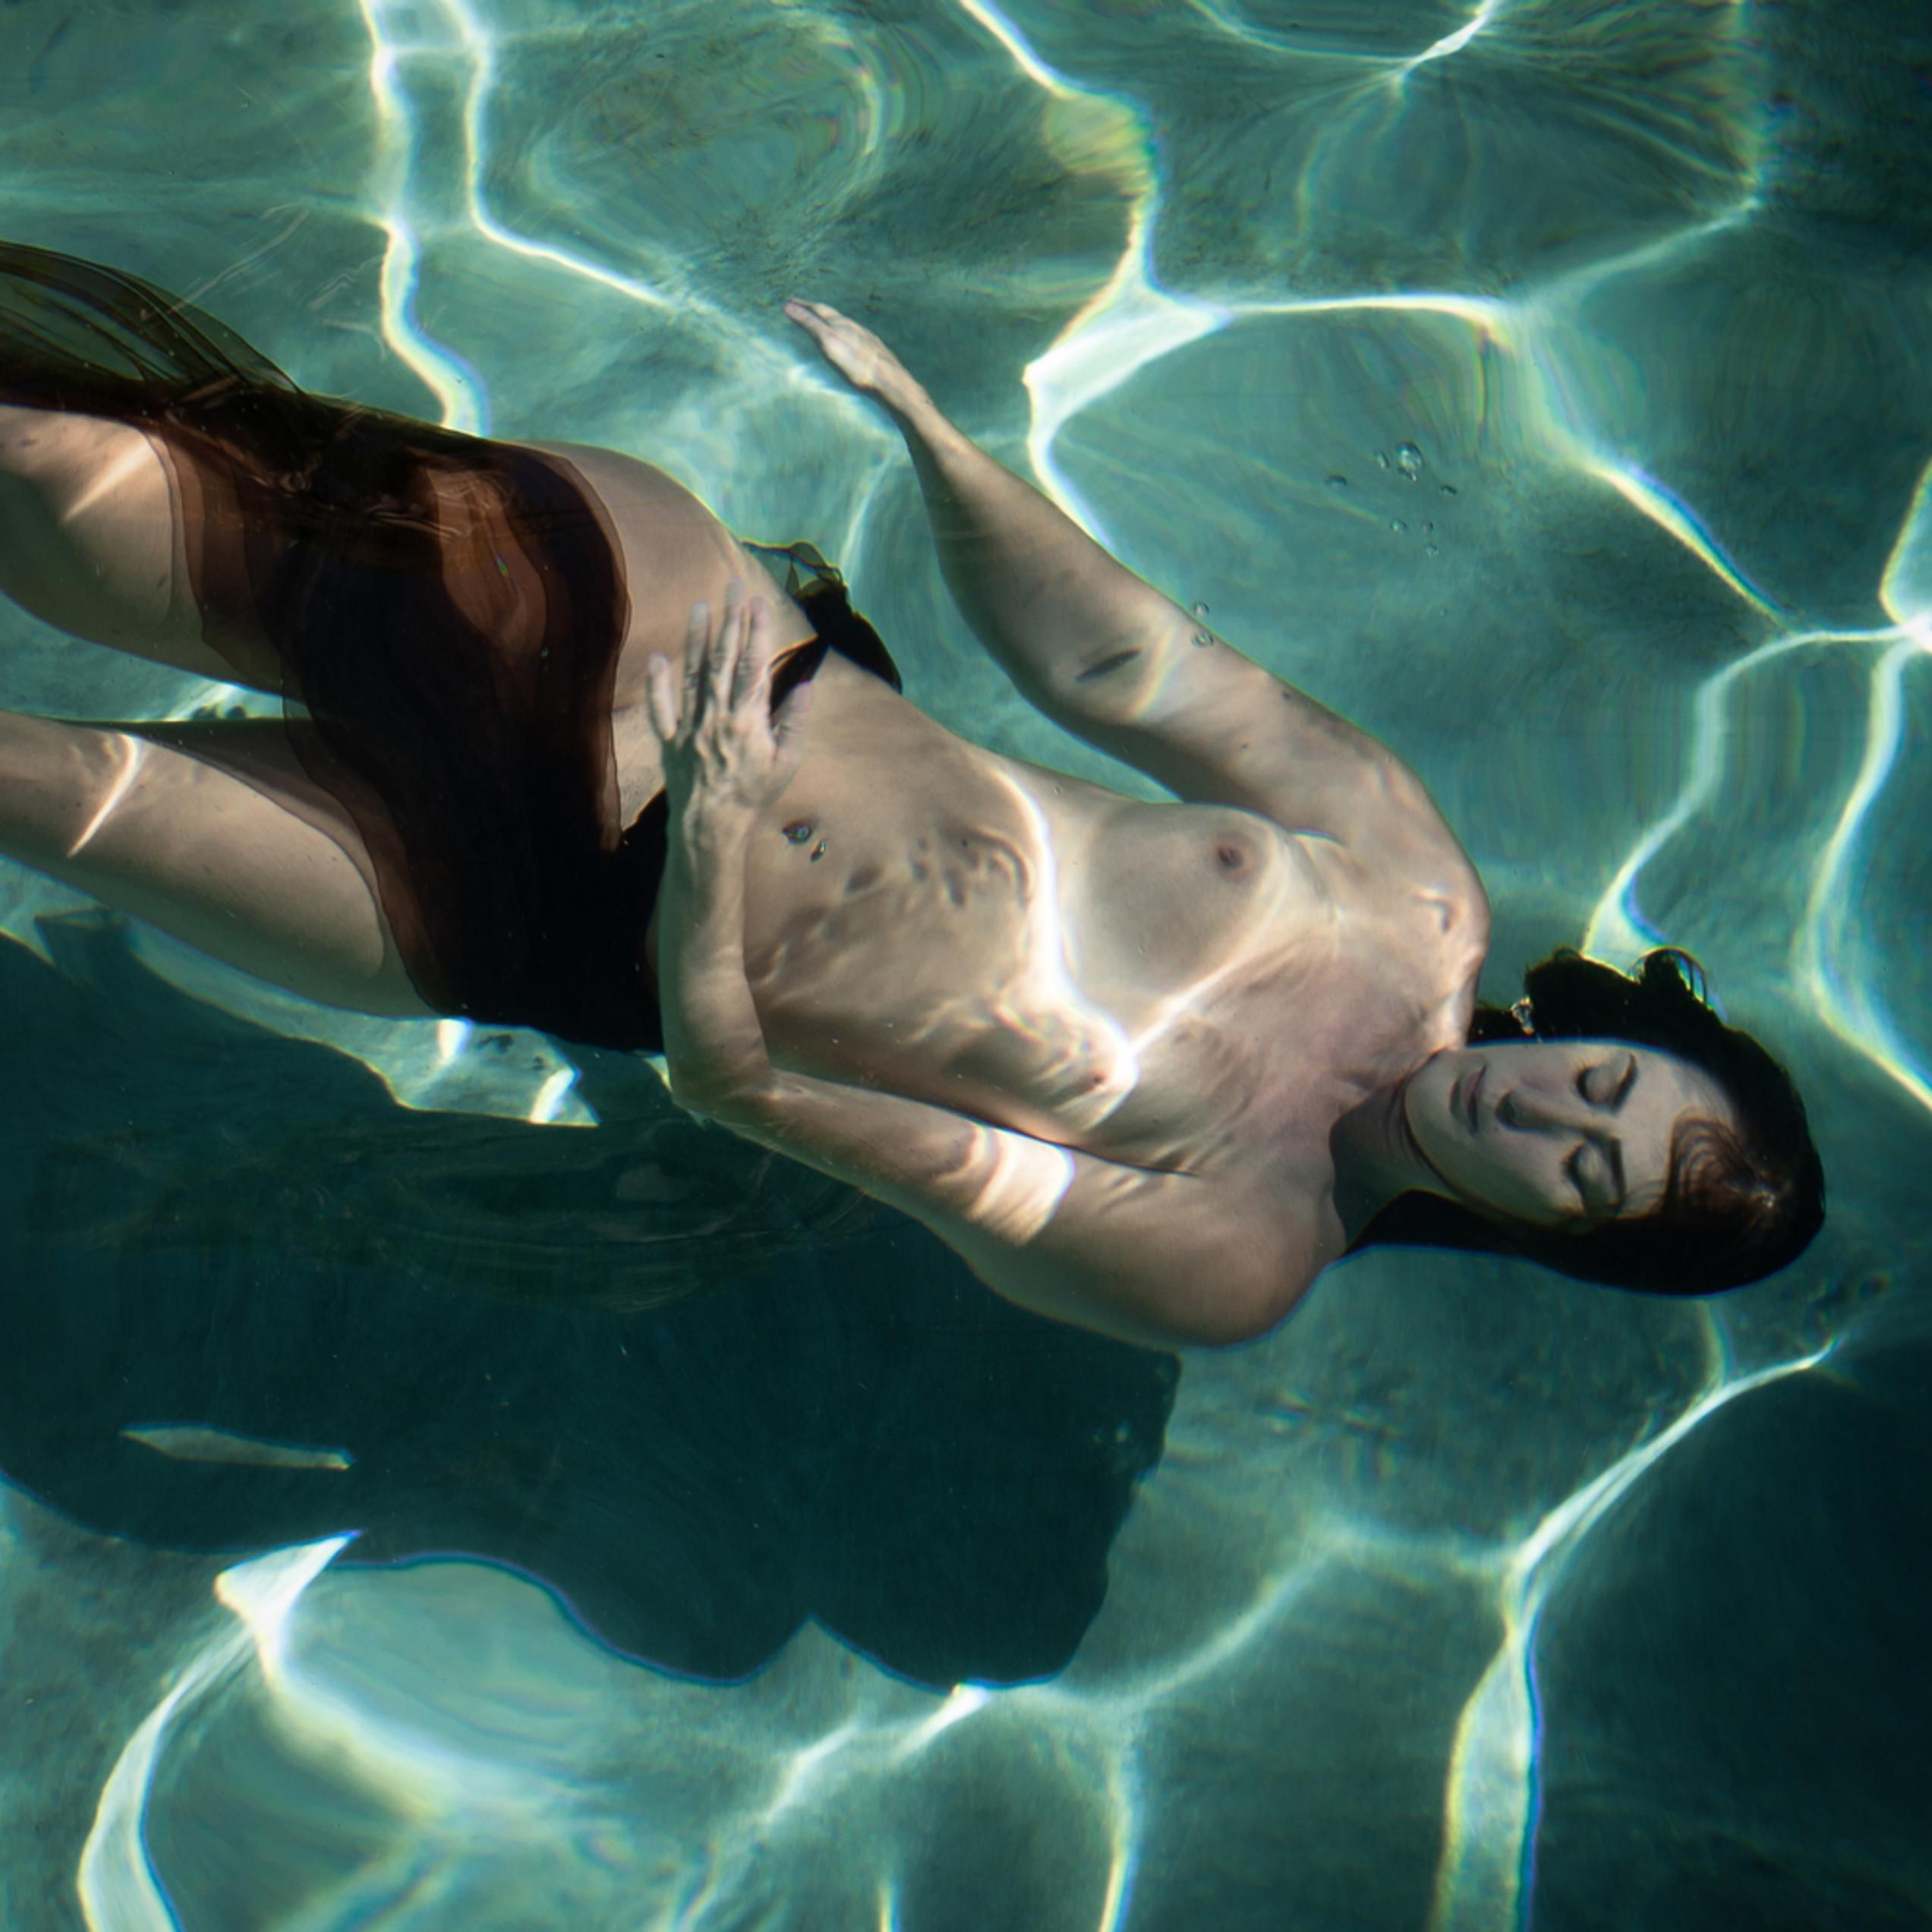 Lindsay pool 7 v90m9i